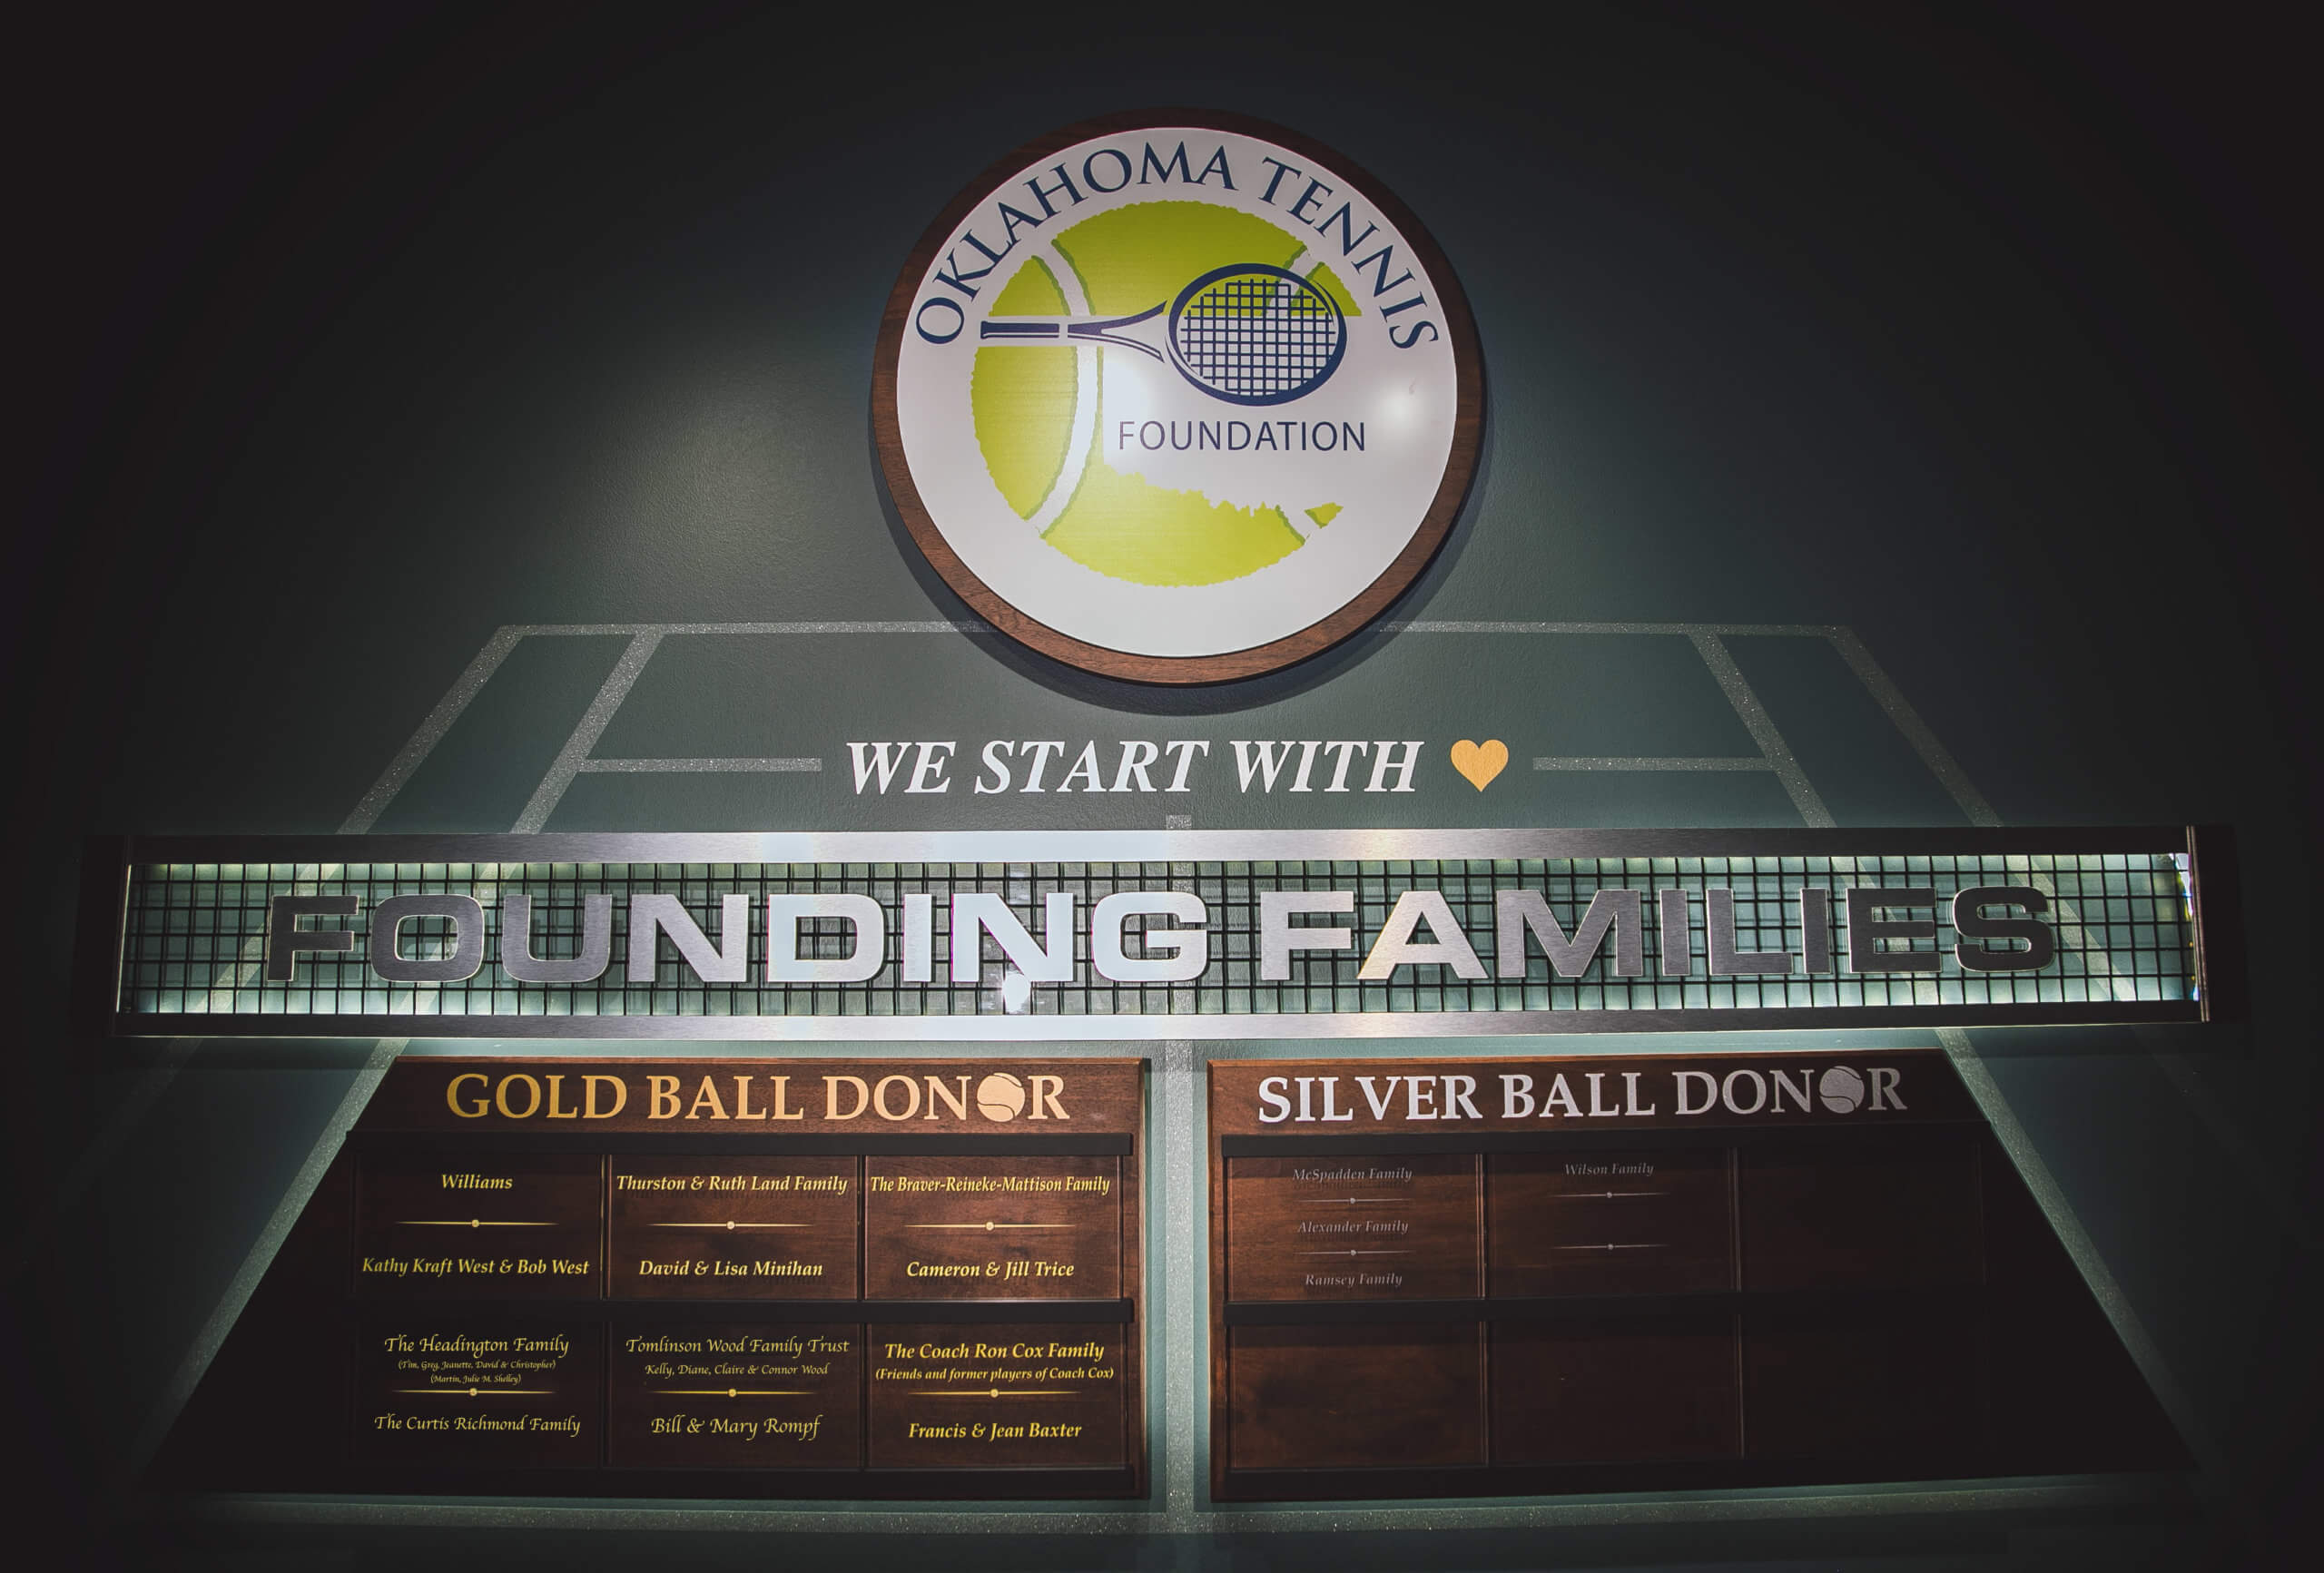 FOUNDING FAMILY WALL